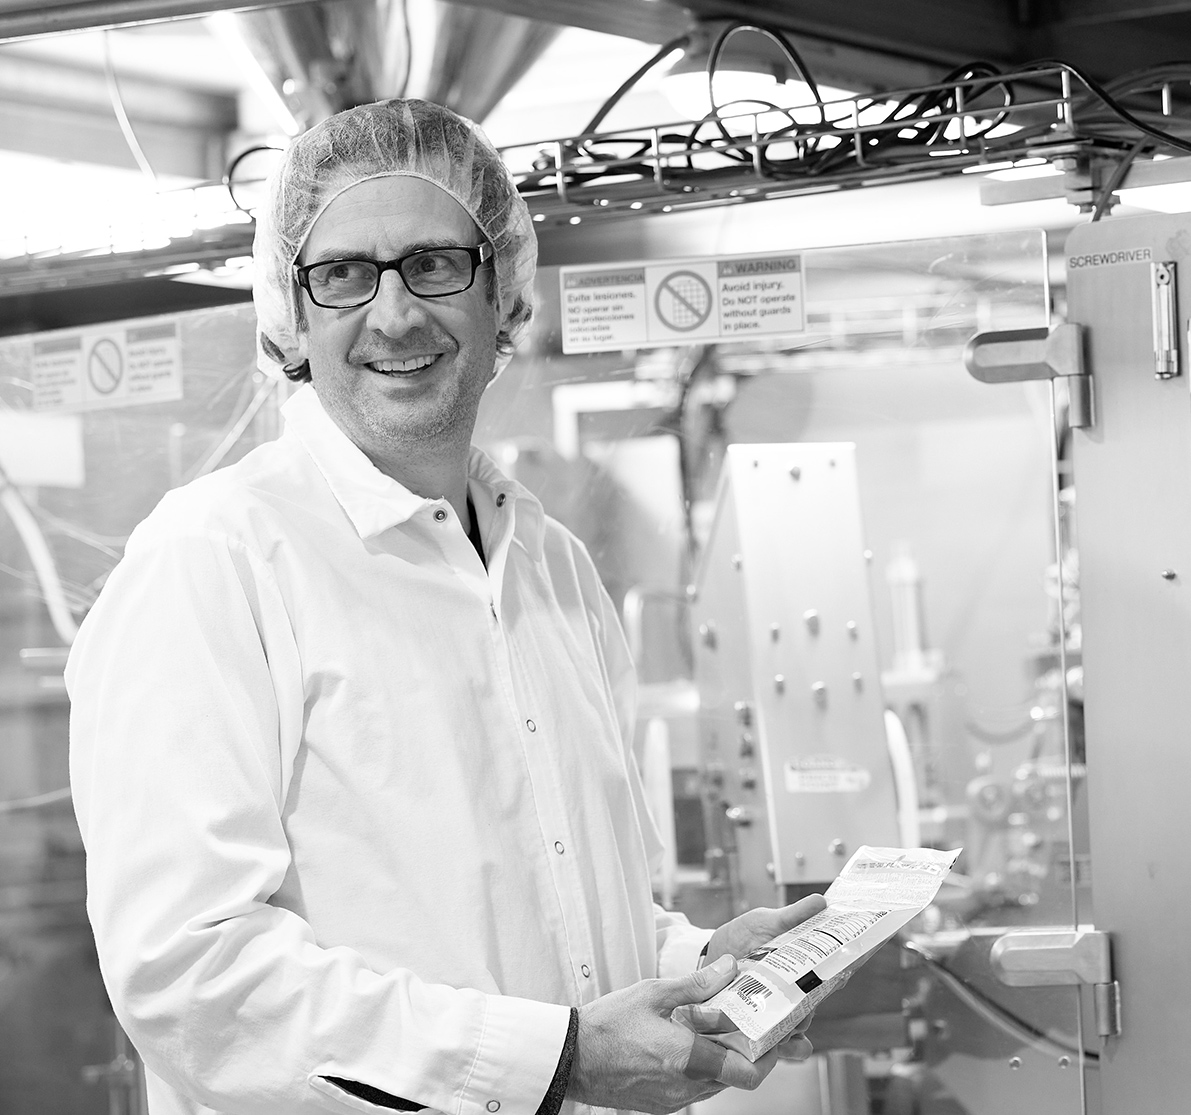 Jeff Grogg, Founder